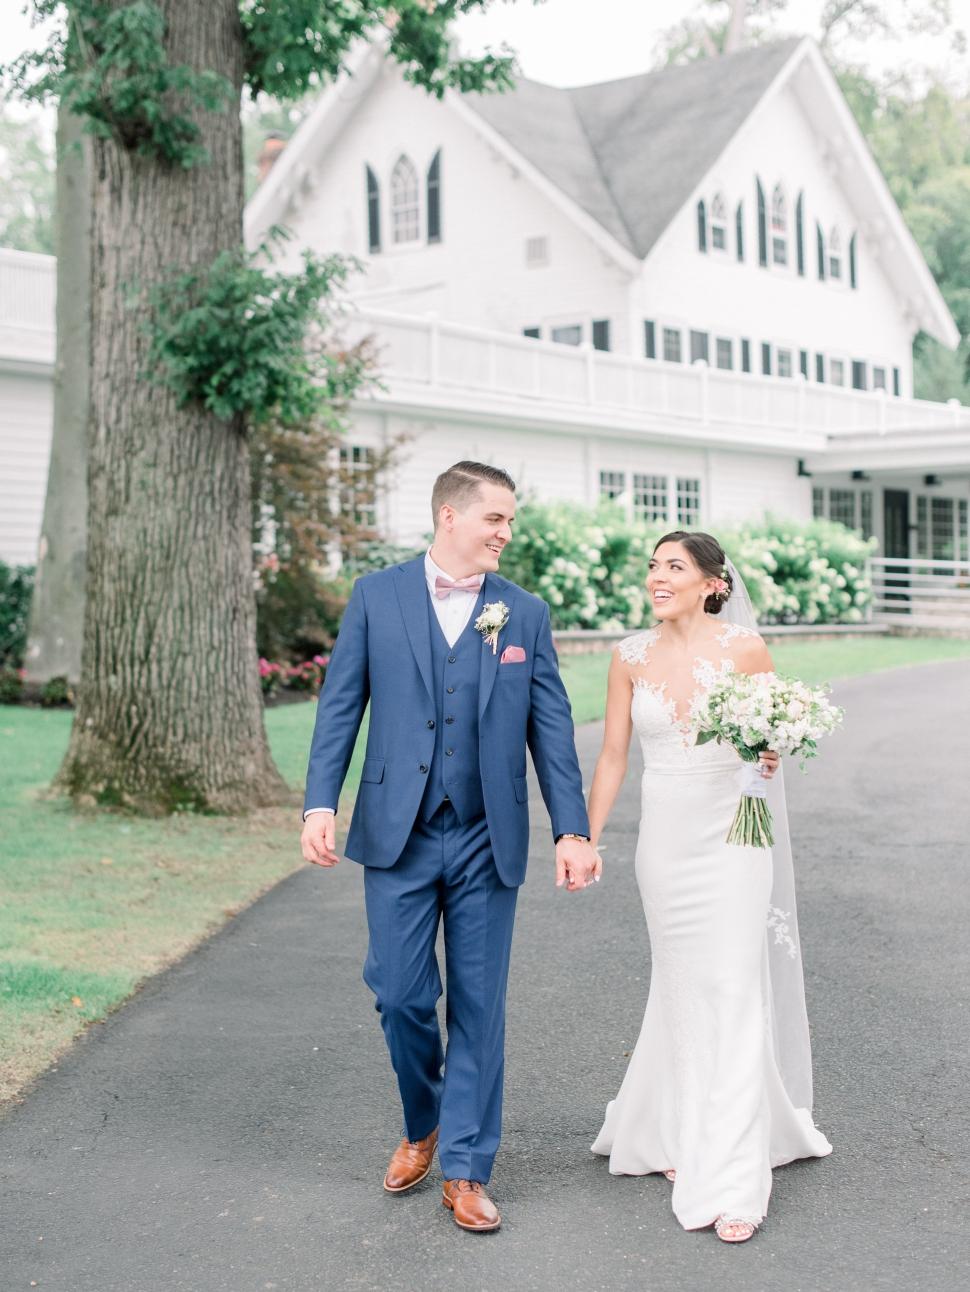 New-Jersey-Wedding-Photographer-Cassi-Claire-Ryland-Inn-Wedding_12.jpg